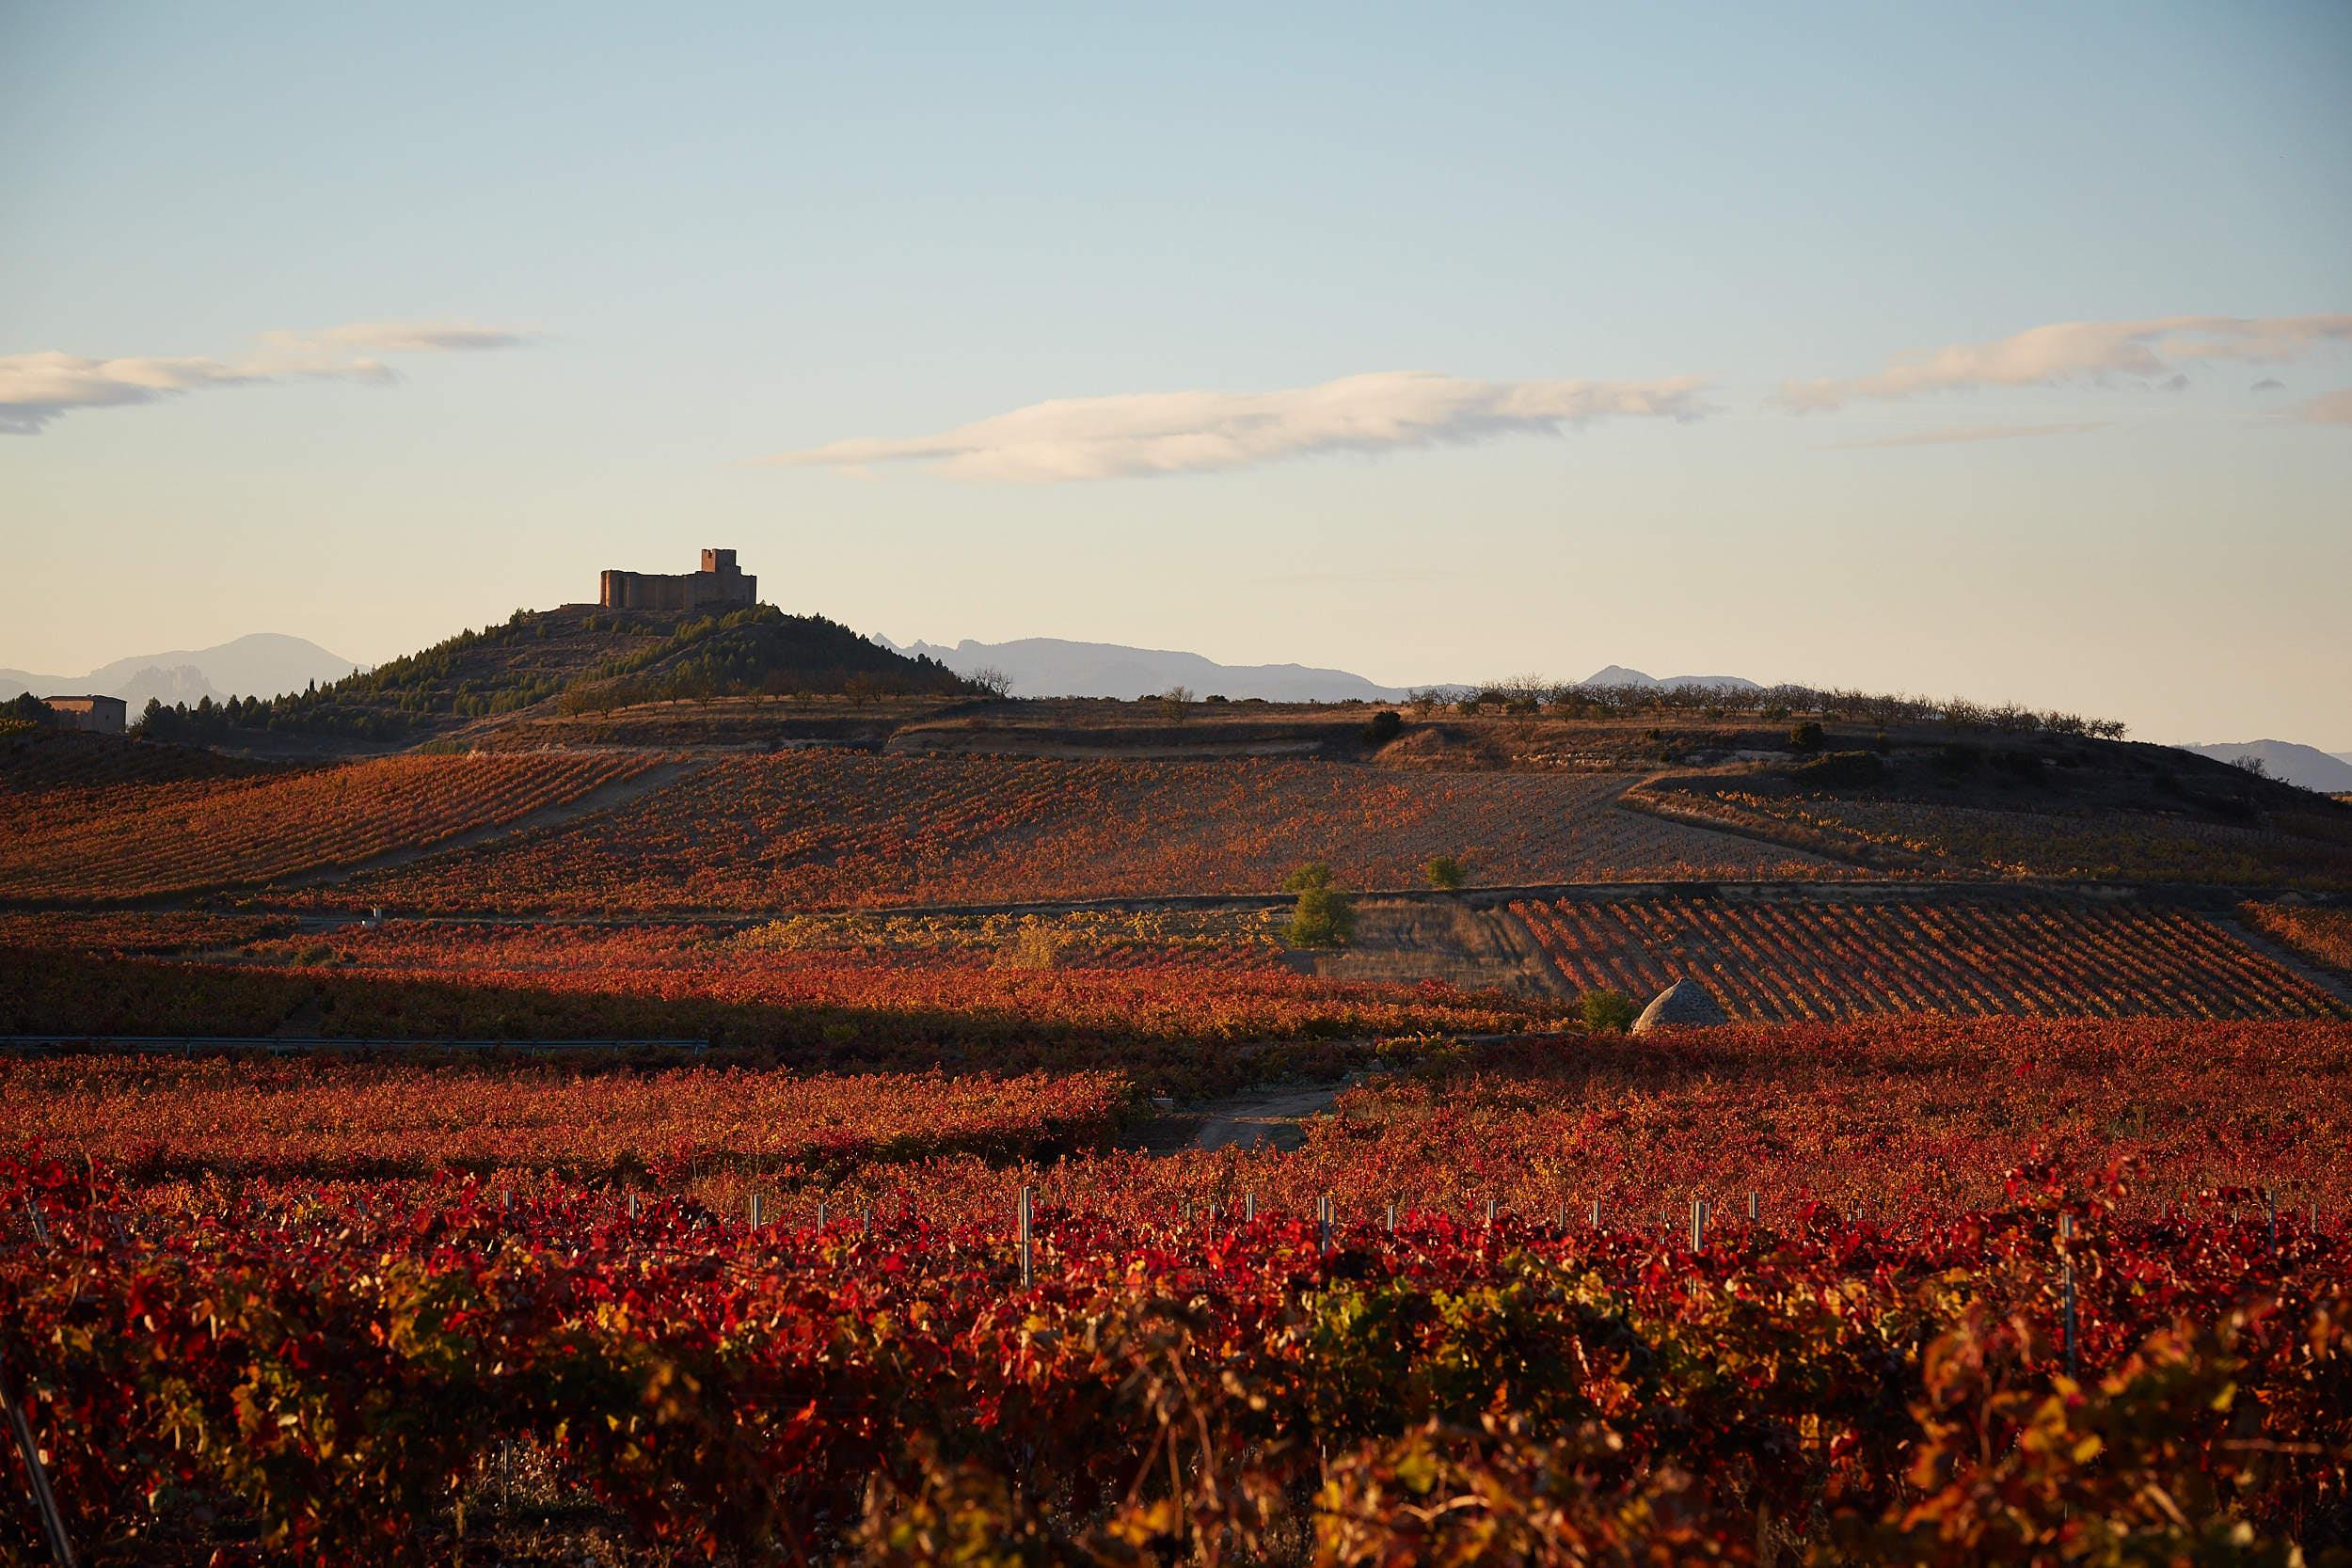 15/11/16 Davalillo castle among Rioja vineyards, Spain. Foto de James Sturcke | www.sturcke.org